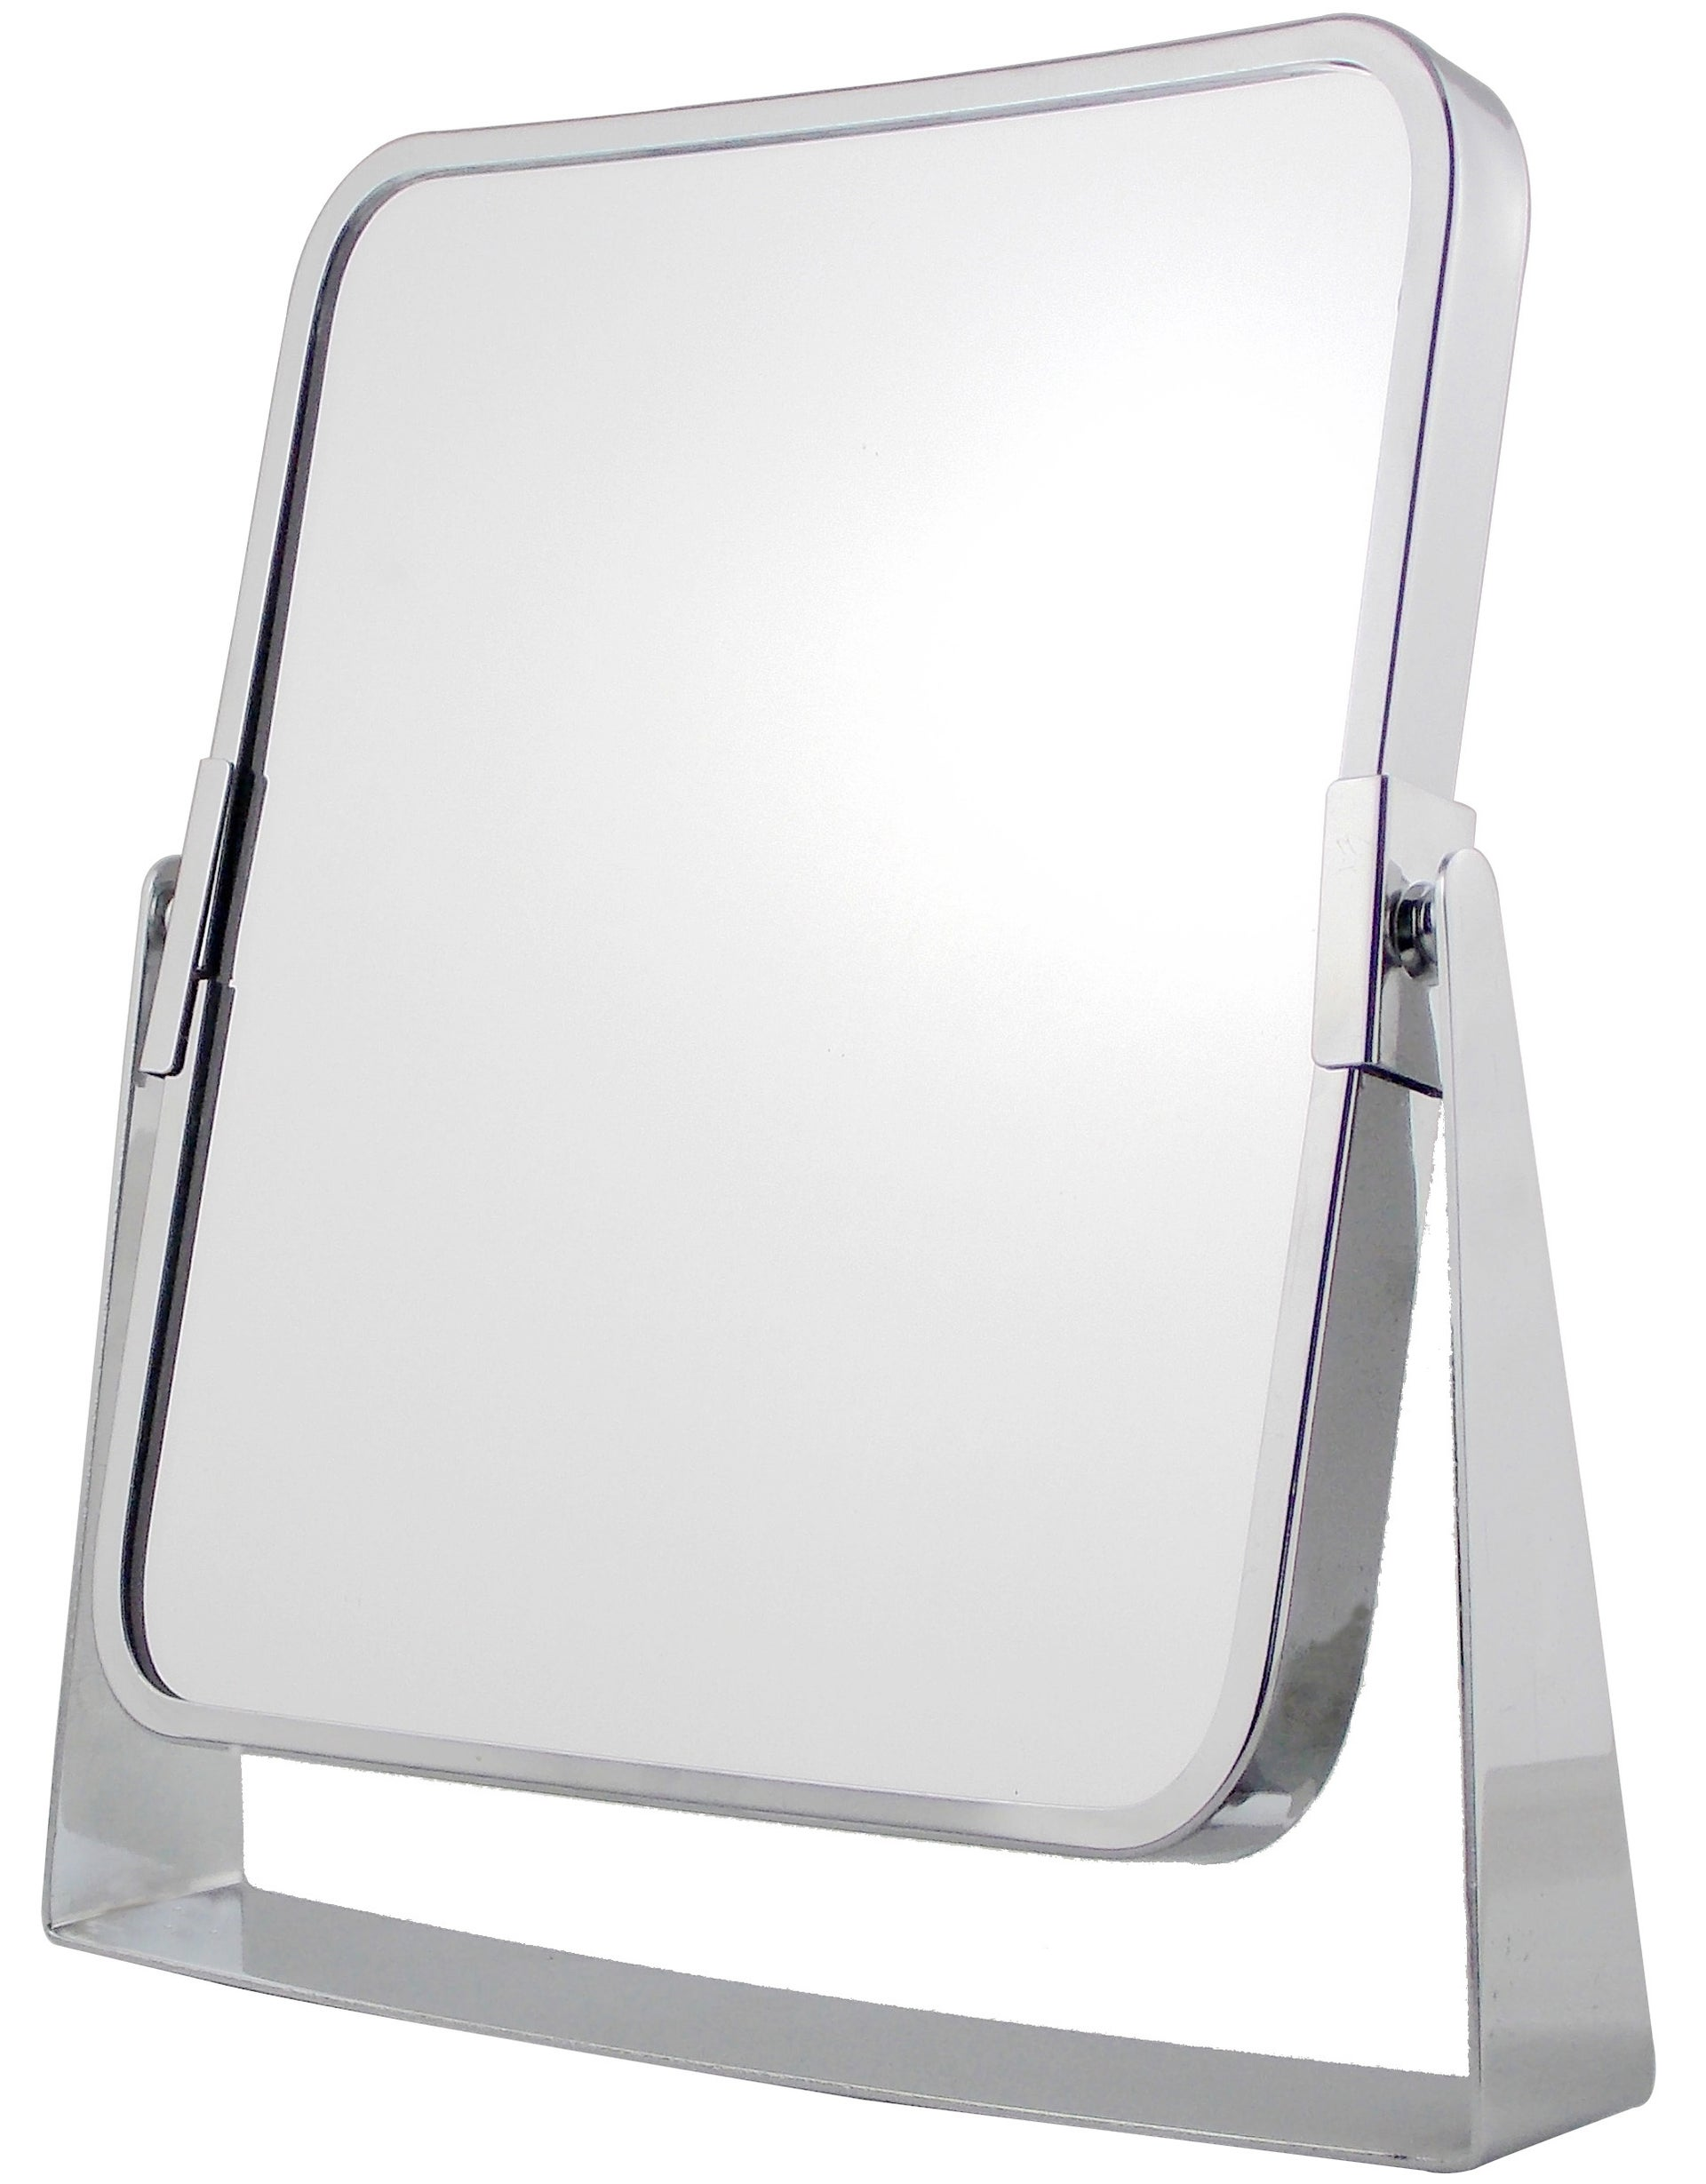 Miroir Grossissant X 2 Rectangulaire A Poser H 15 8 X L 13 X P 3 Cm Alice Leroy Merlin